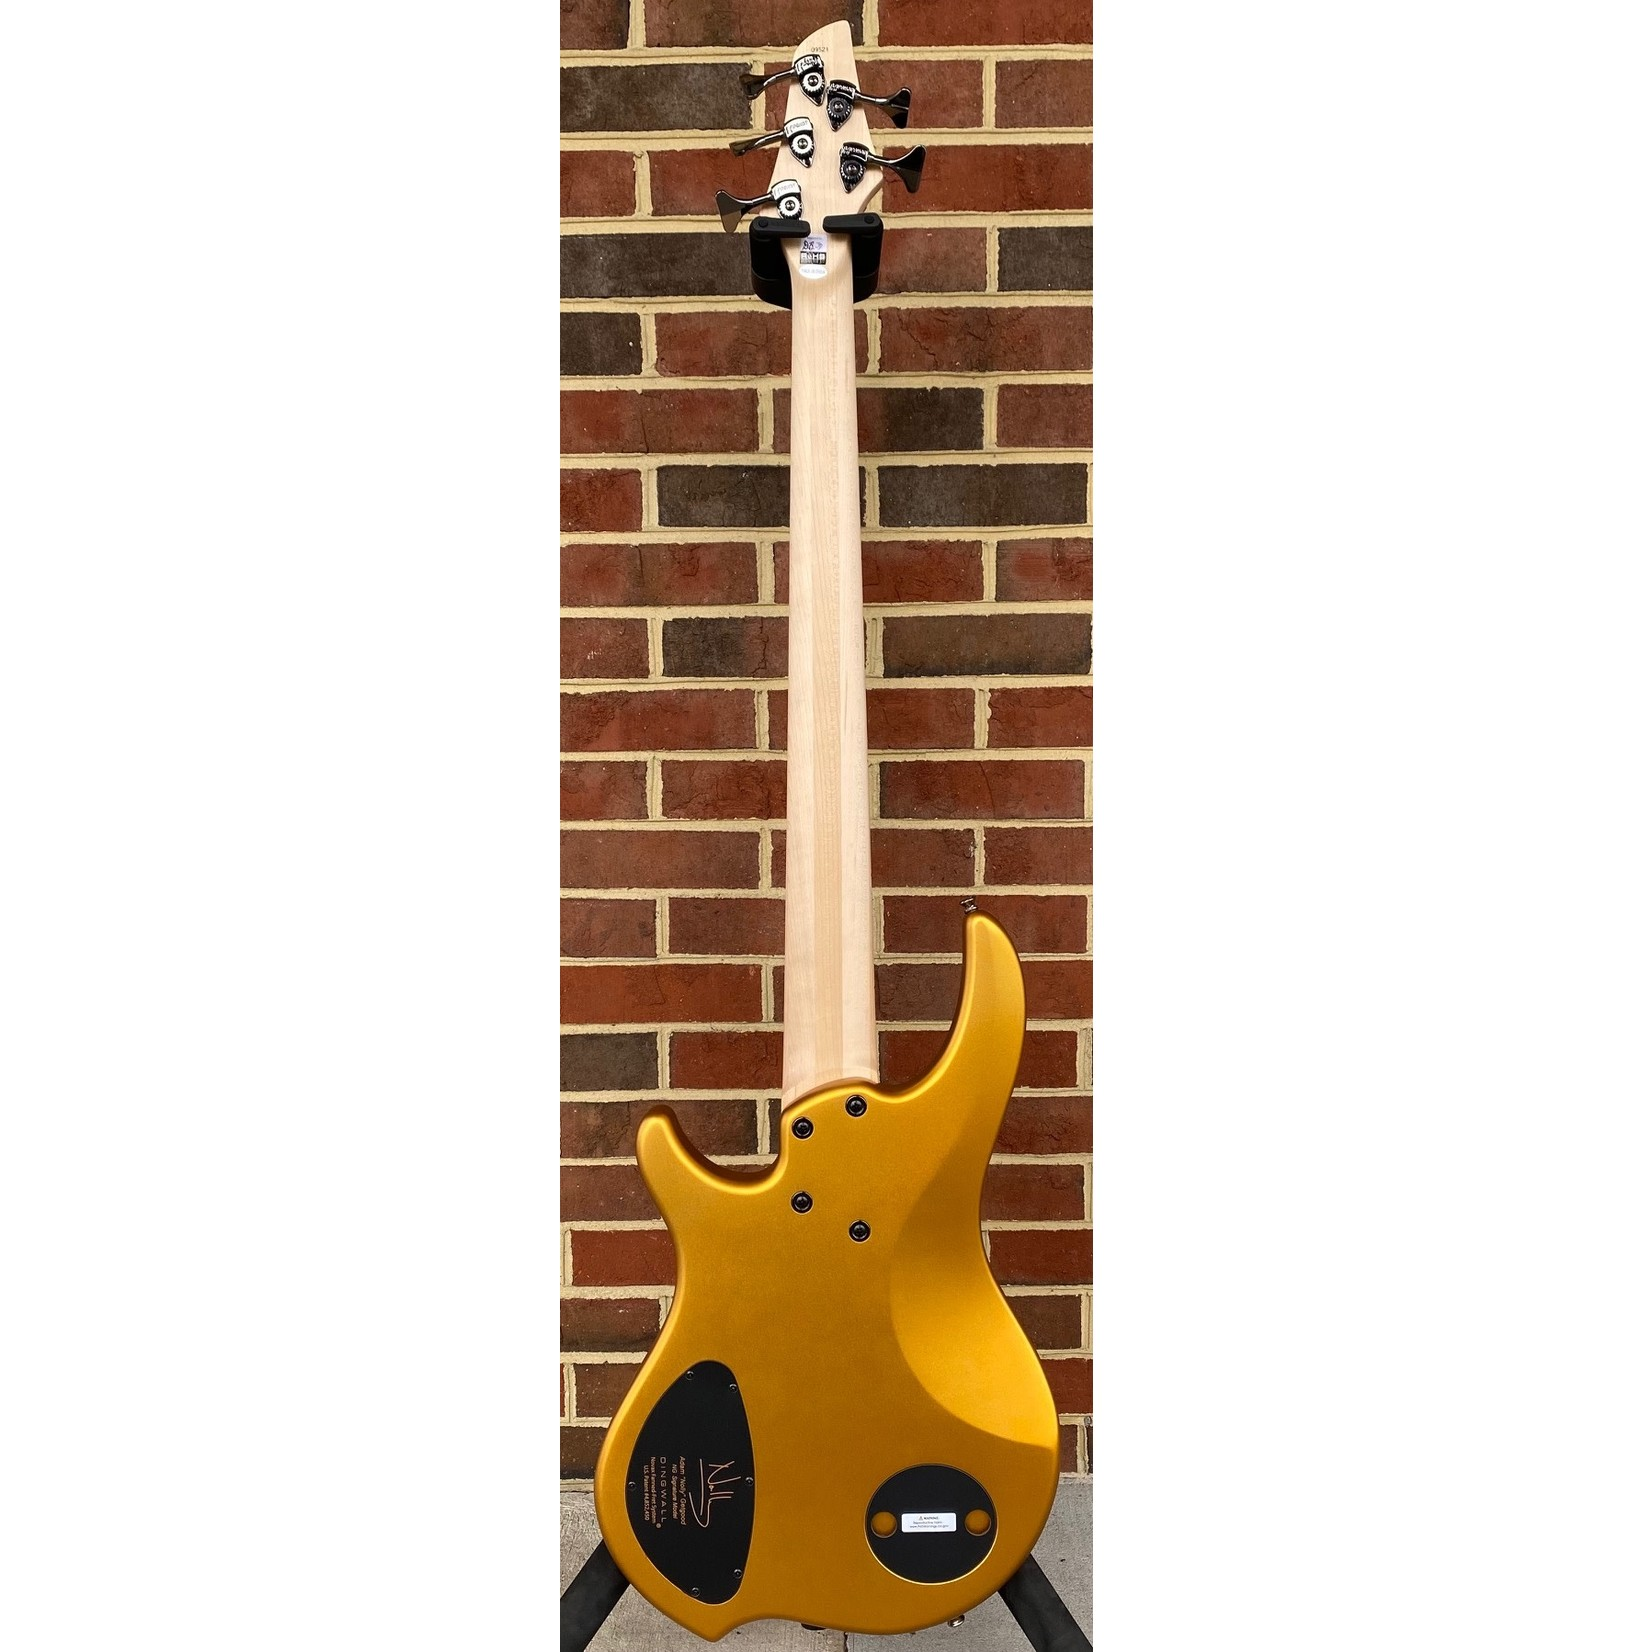 Dingwall Dingwall NG3 5-String, Matte Gold Metallic, Maple Fretboard, Matching Headstock, Dingwall Gig Bag, SN# 9521